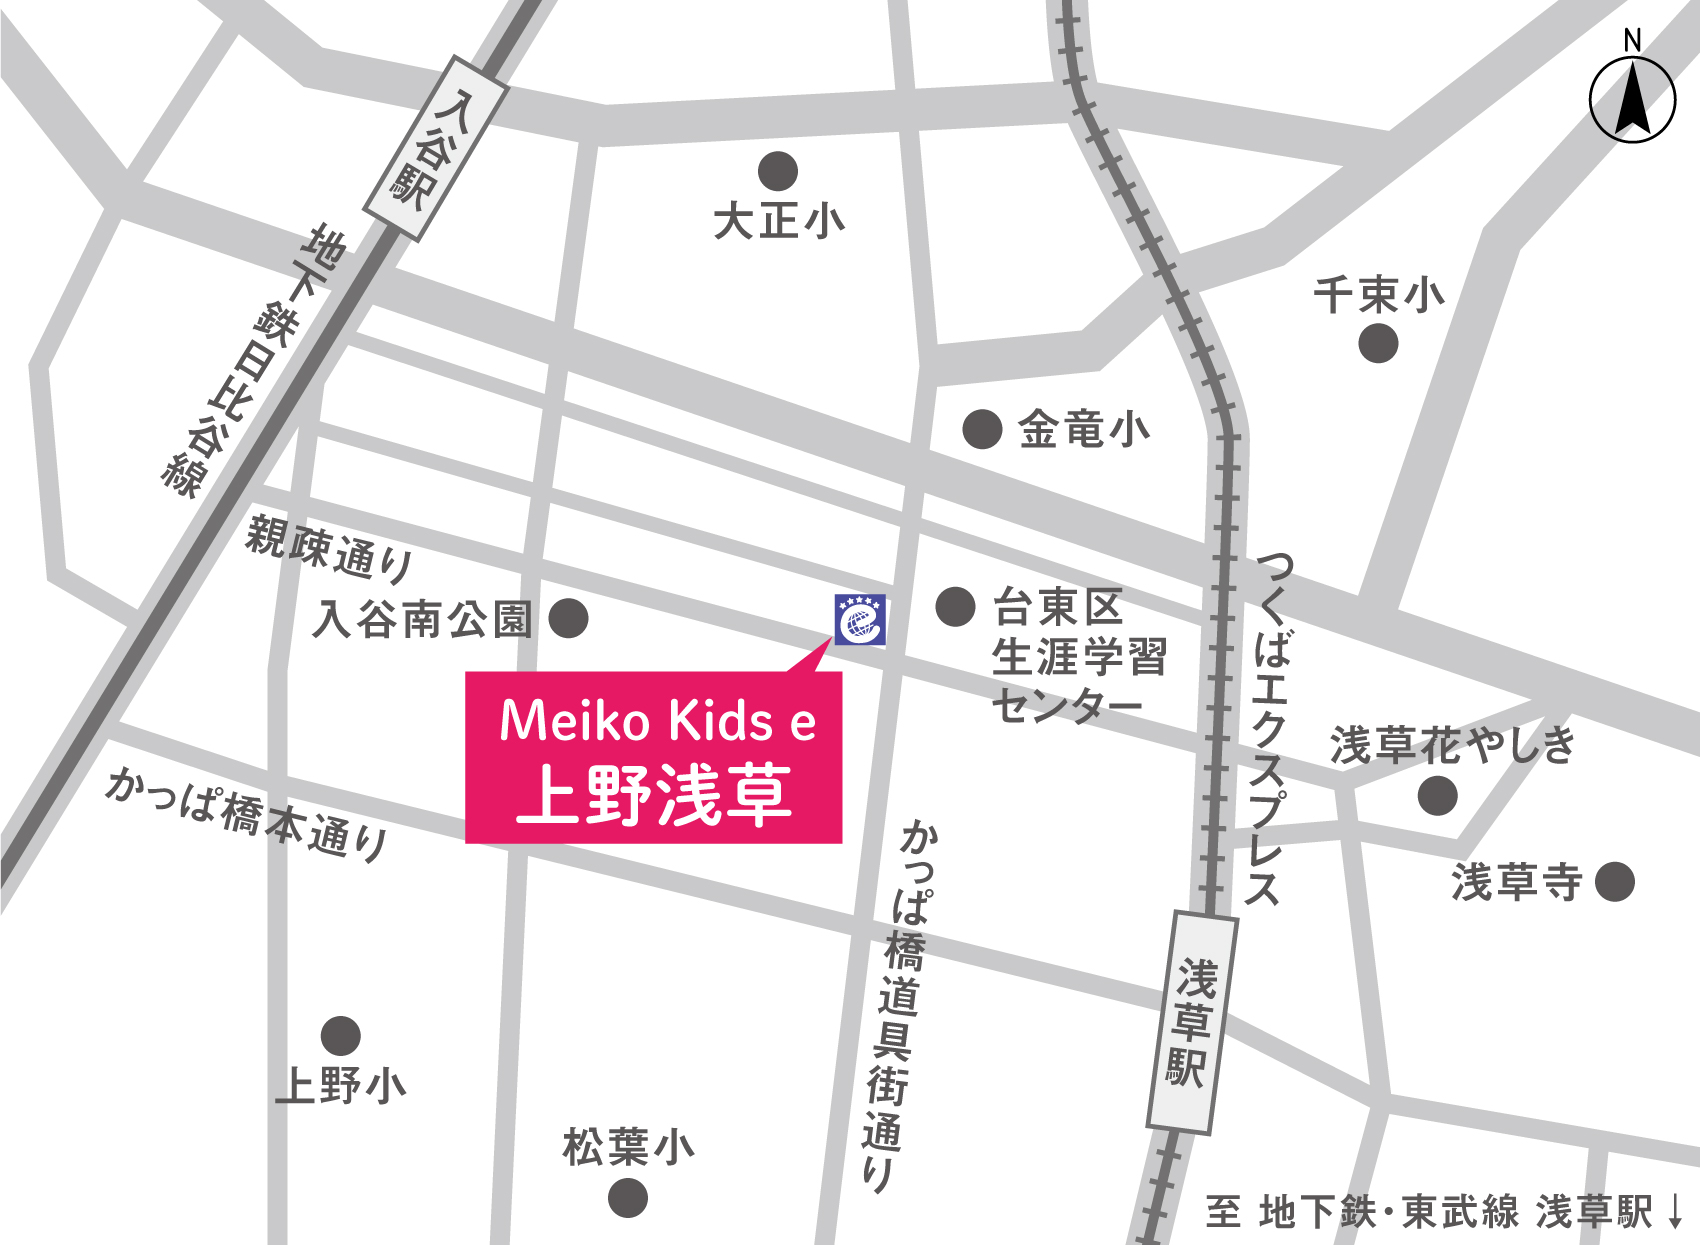 Meiko Kids e 上野浅草